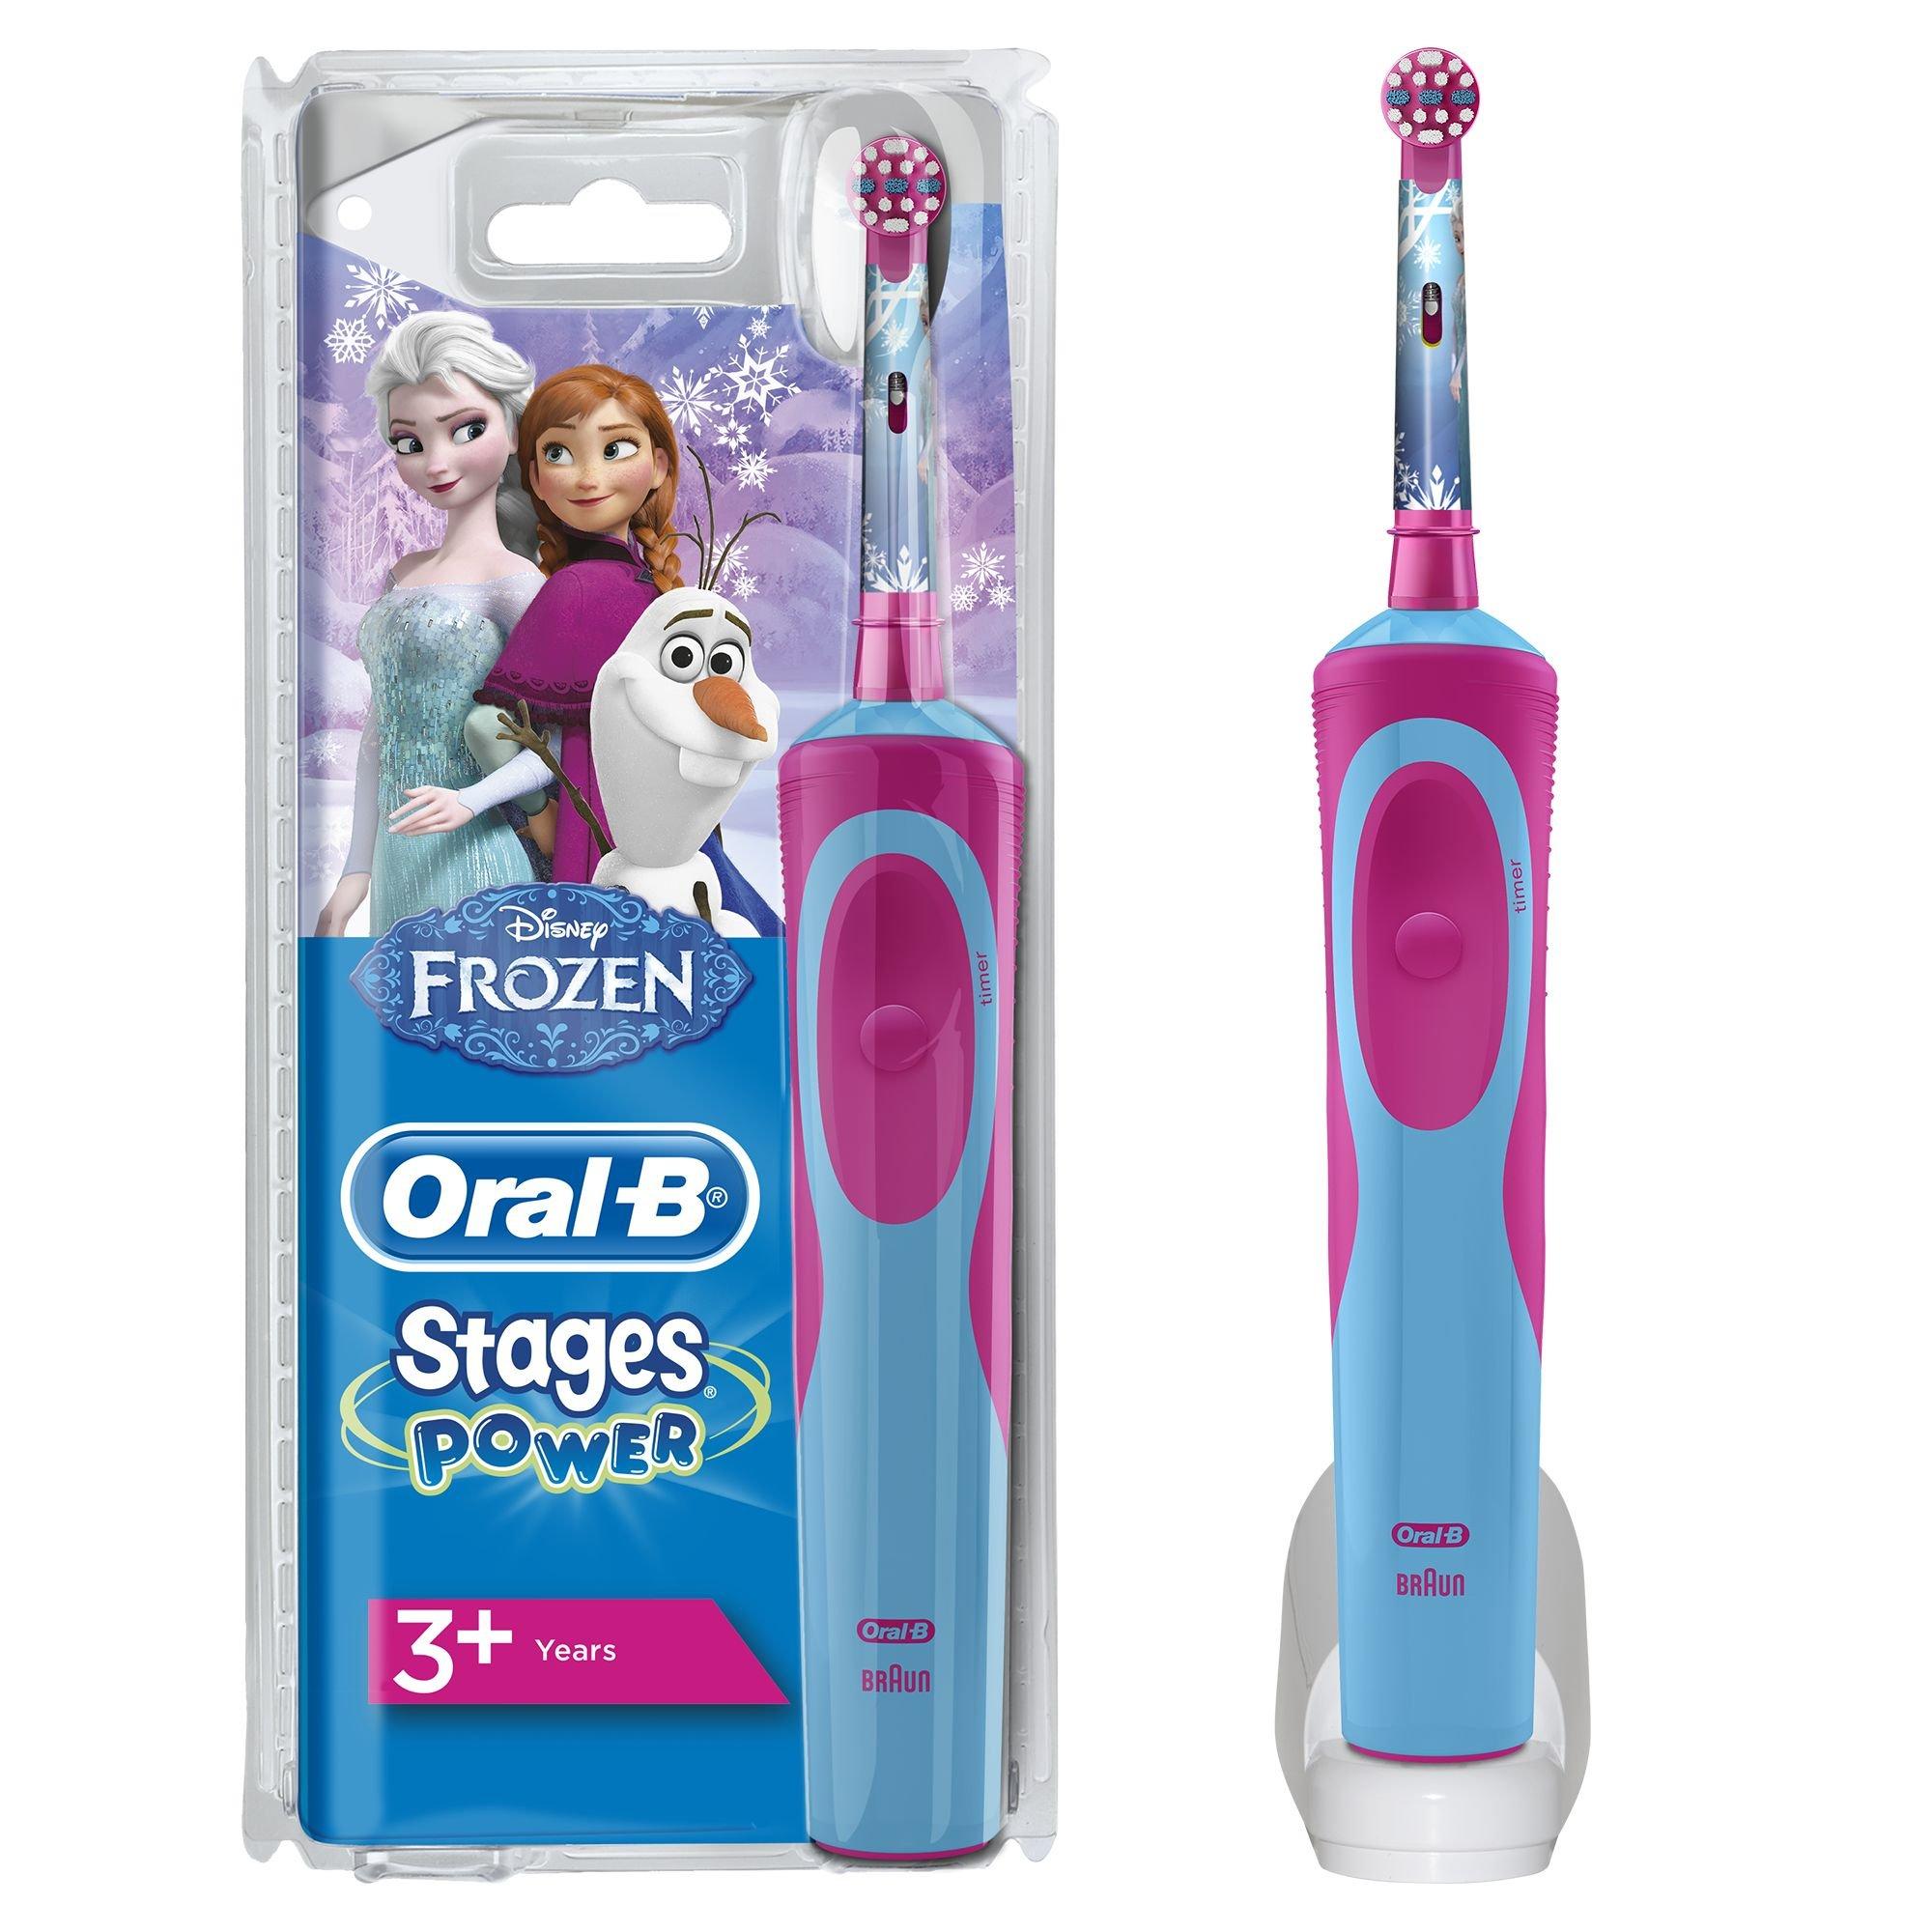 Oral-B Stages Power Kids Cepillo de Dientes Eléctrico con los Personajes de Frozen product